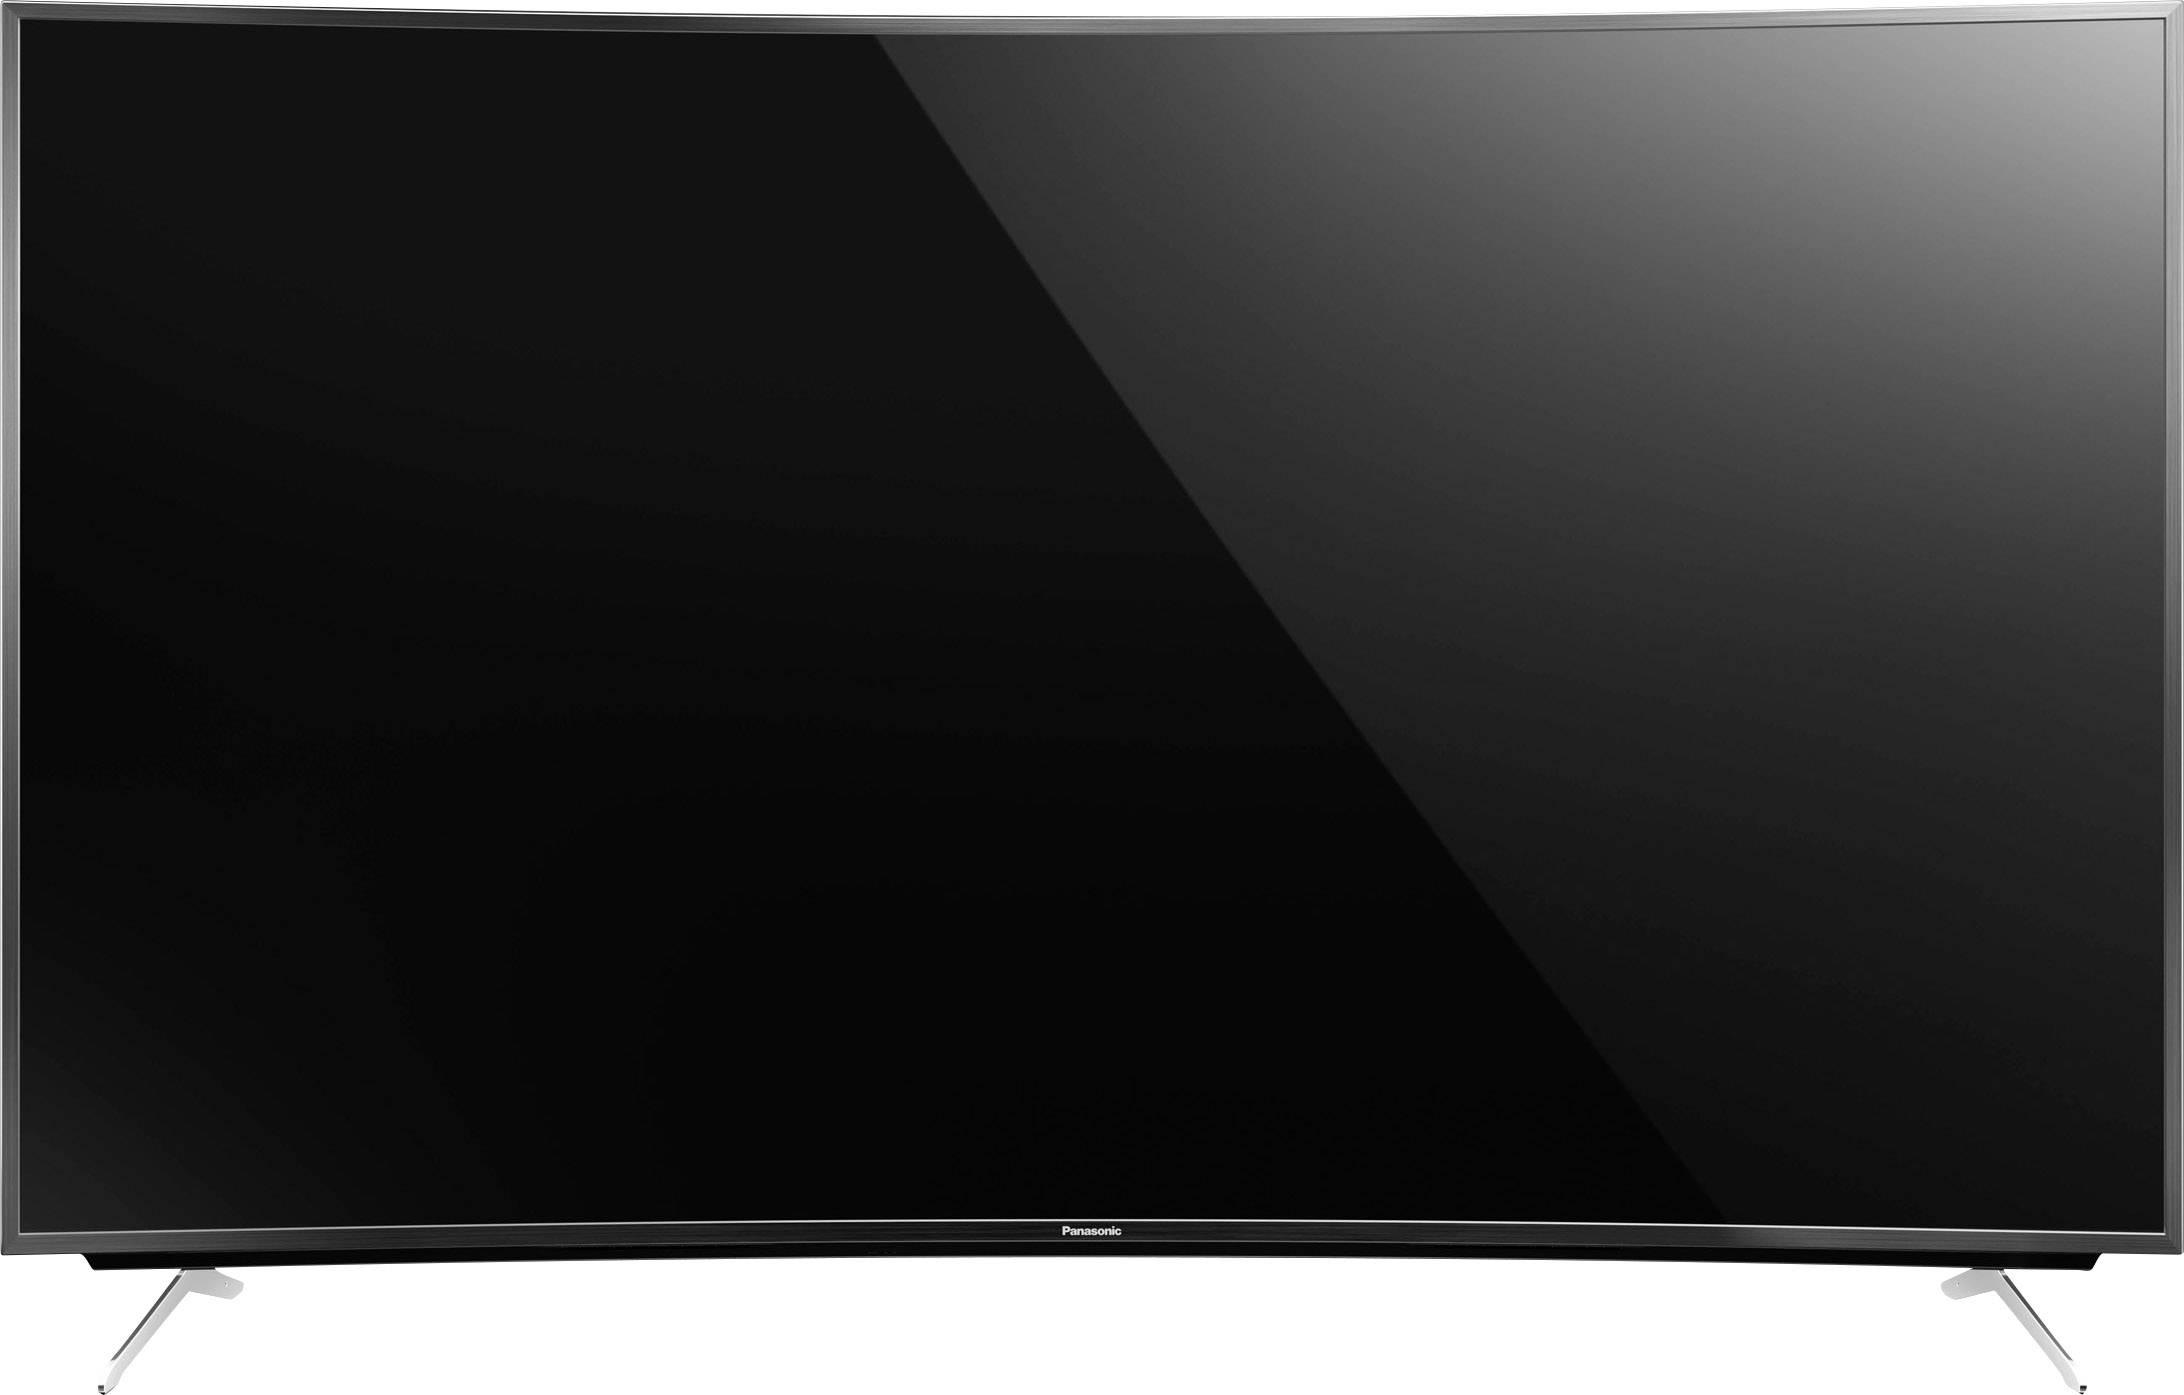 Panasonic Viera TX-65CRW734 TV Windows 8 Driver Download